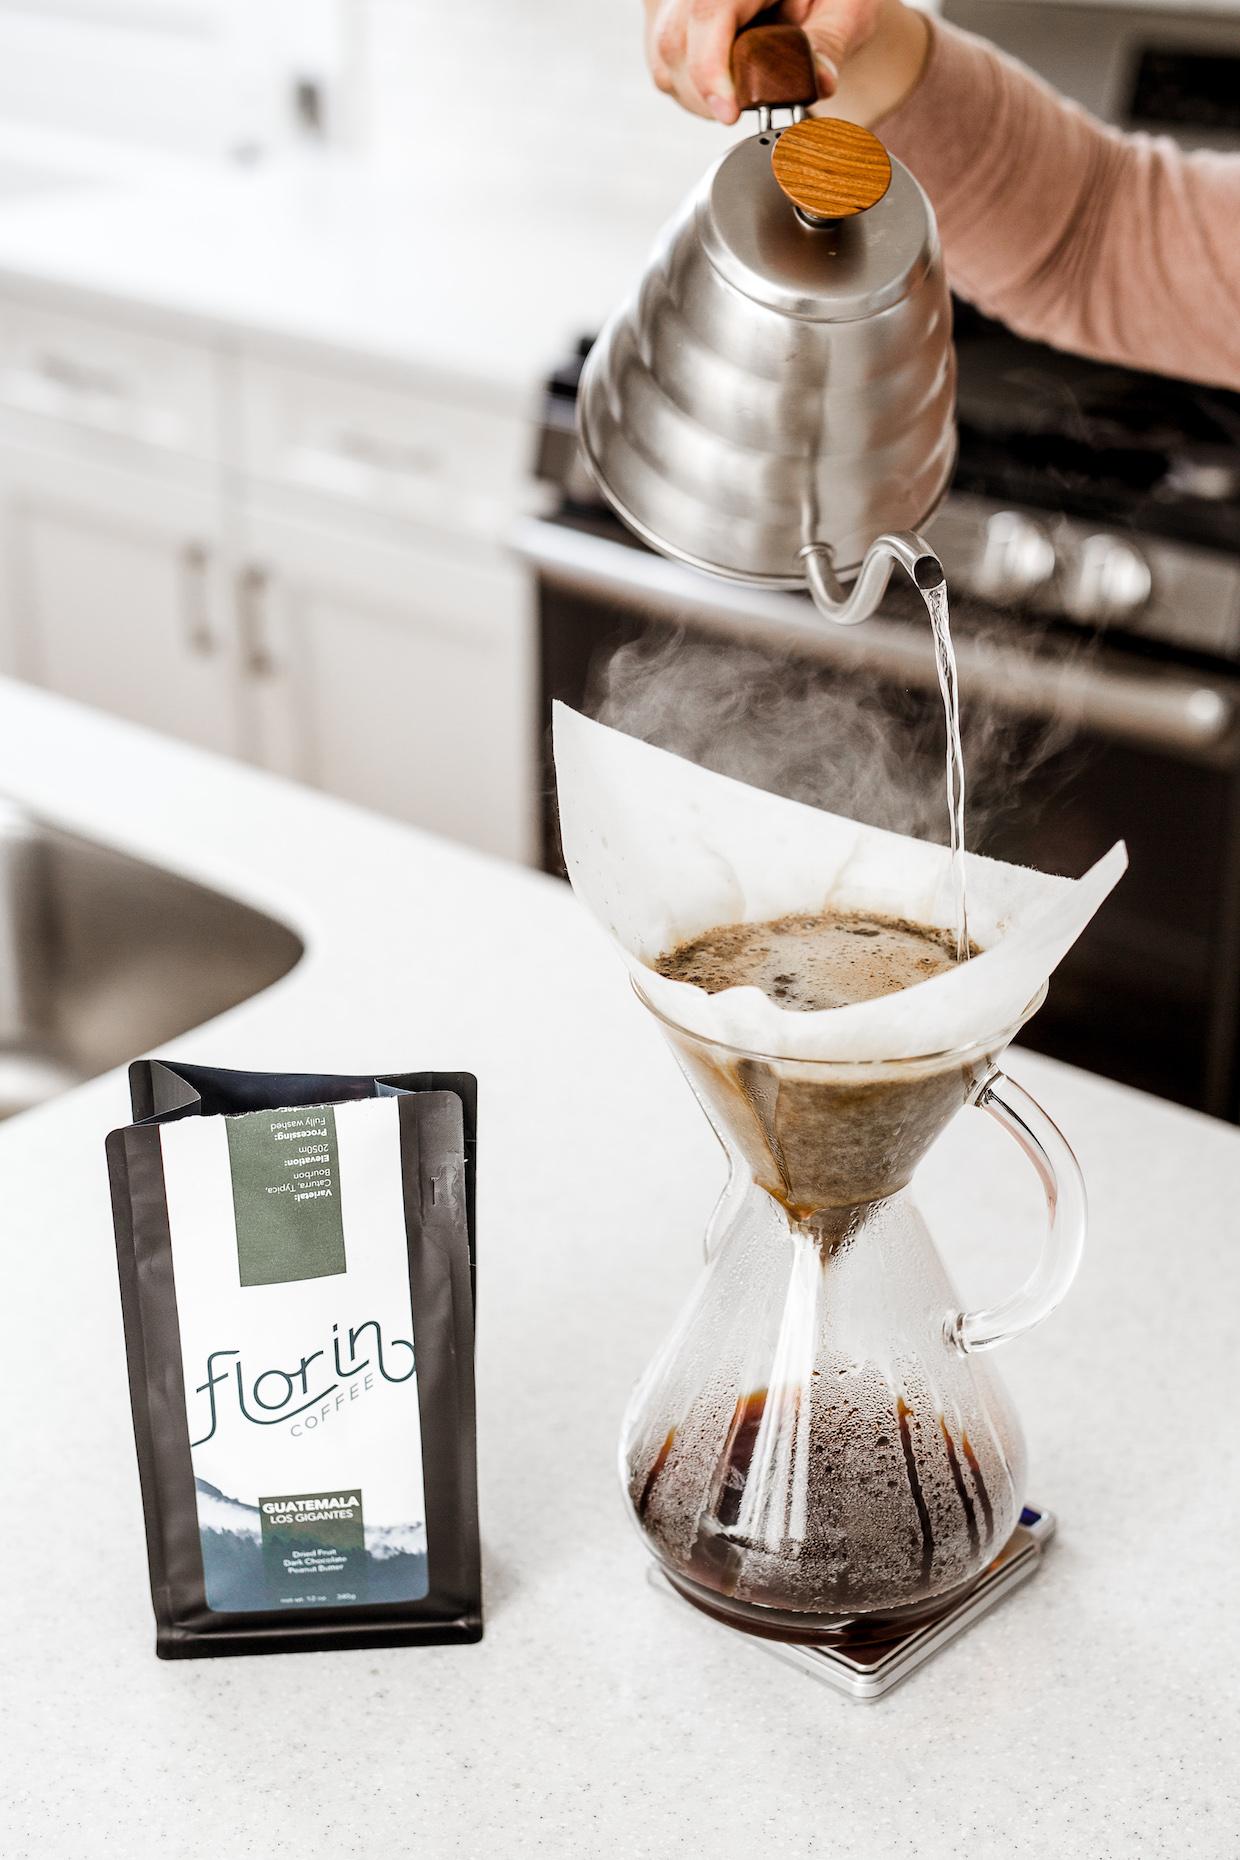 Florin Coffee Columbus